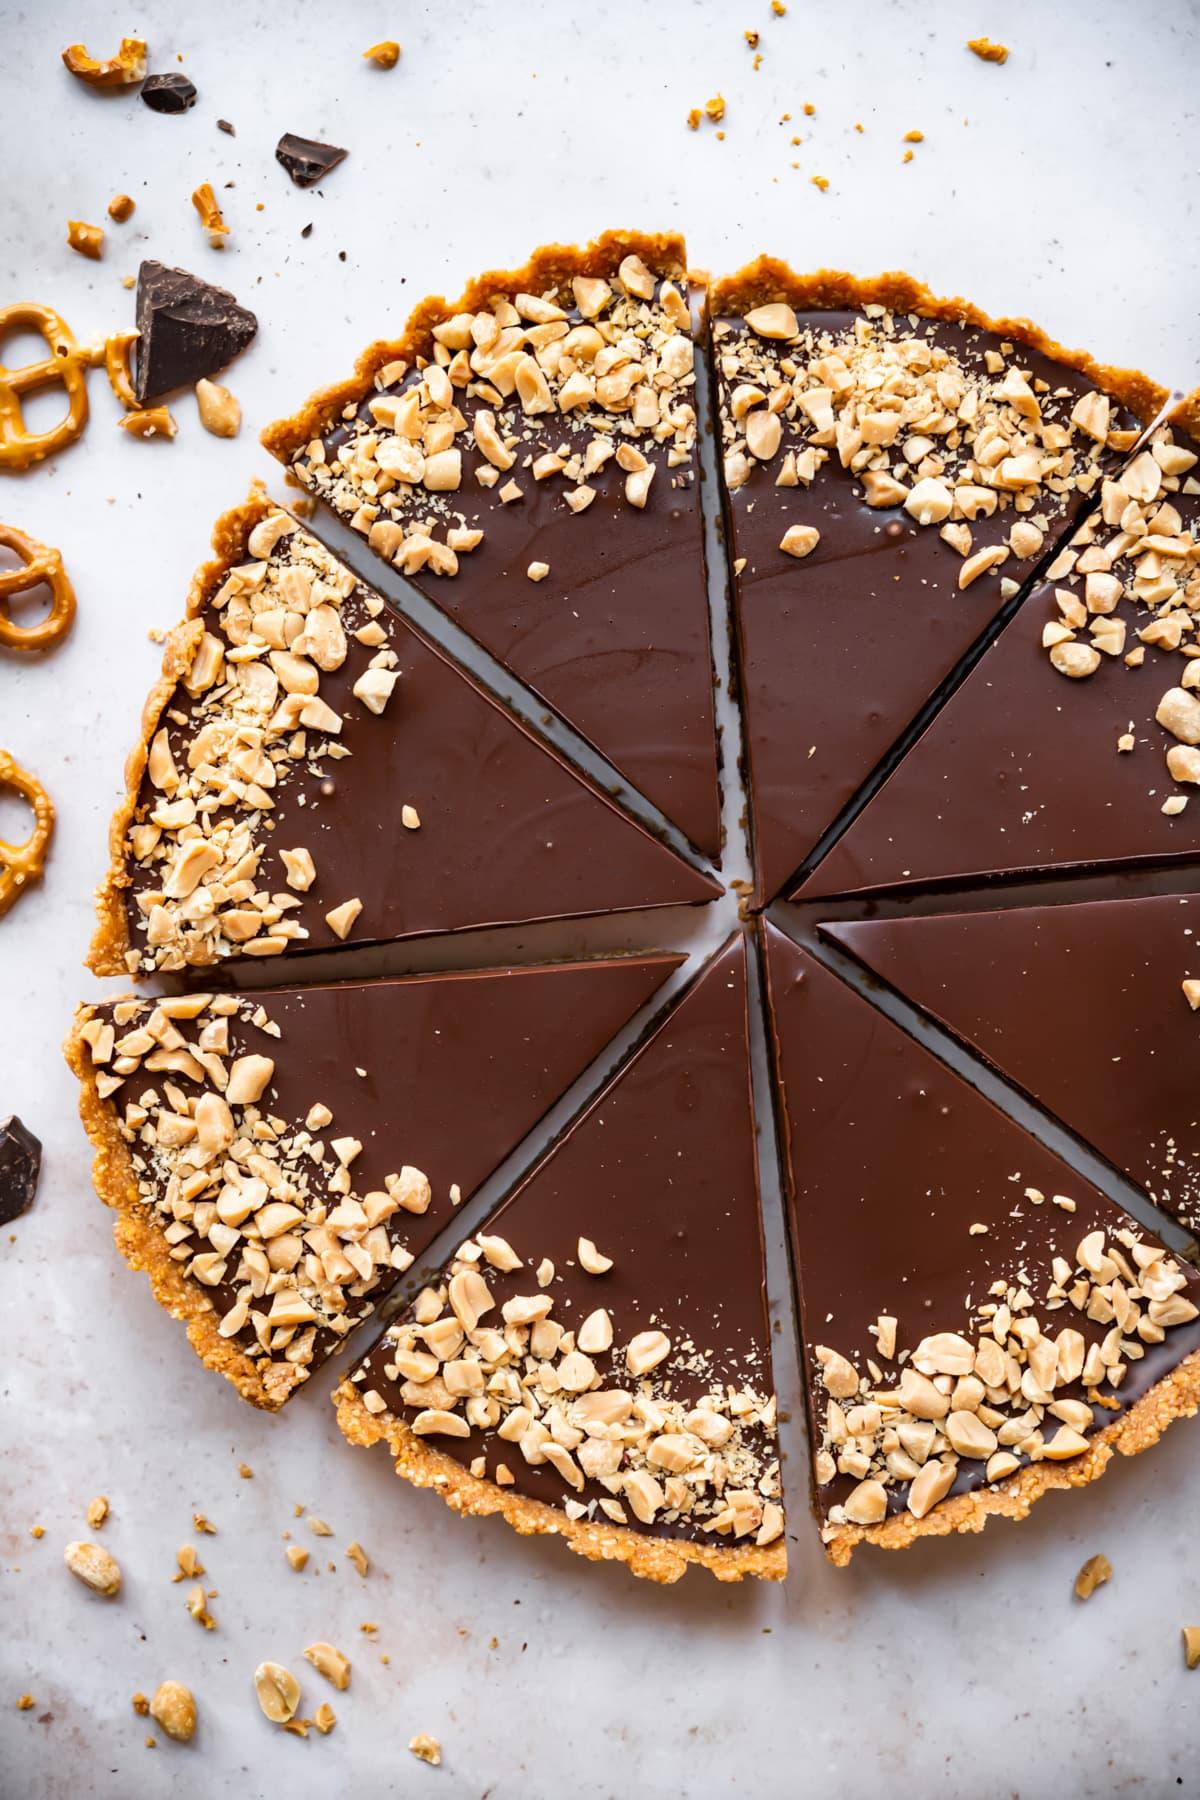 overhead view of chocolate peanut butter pretzel tart cut into slices.